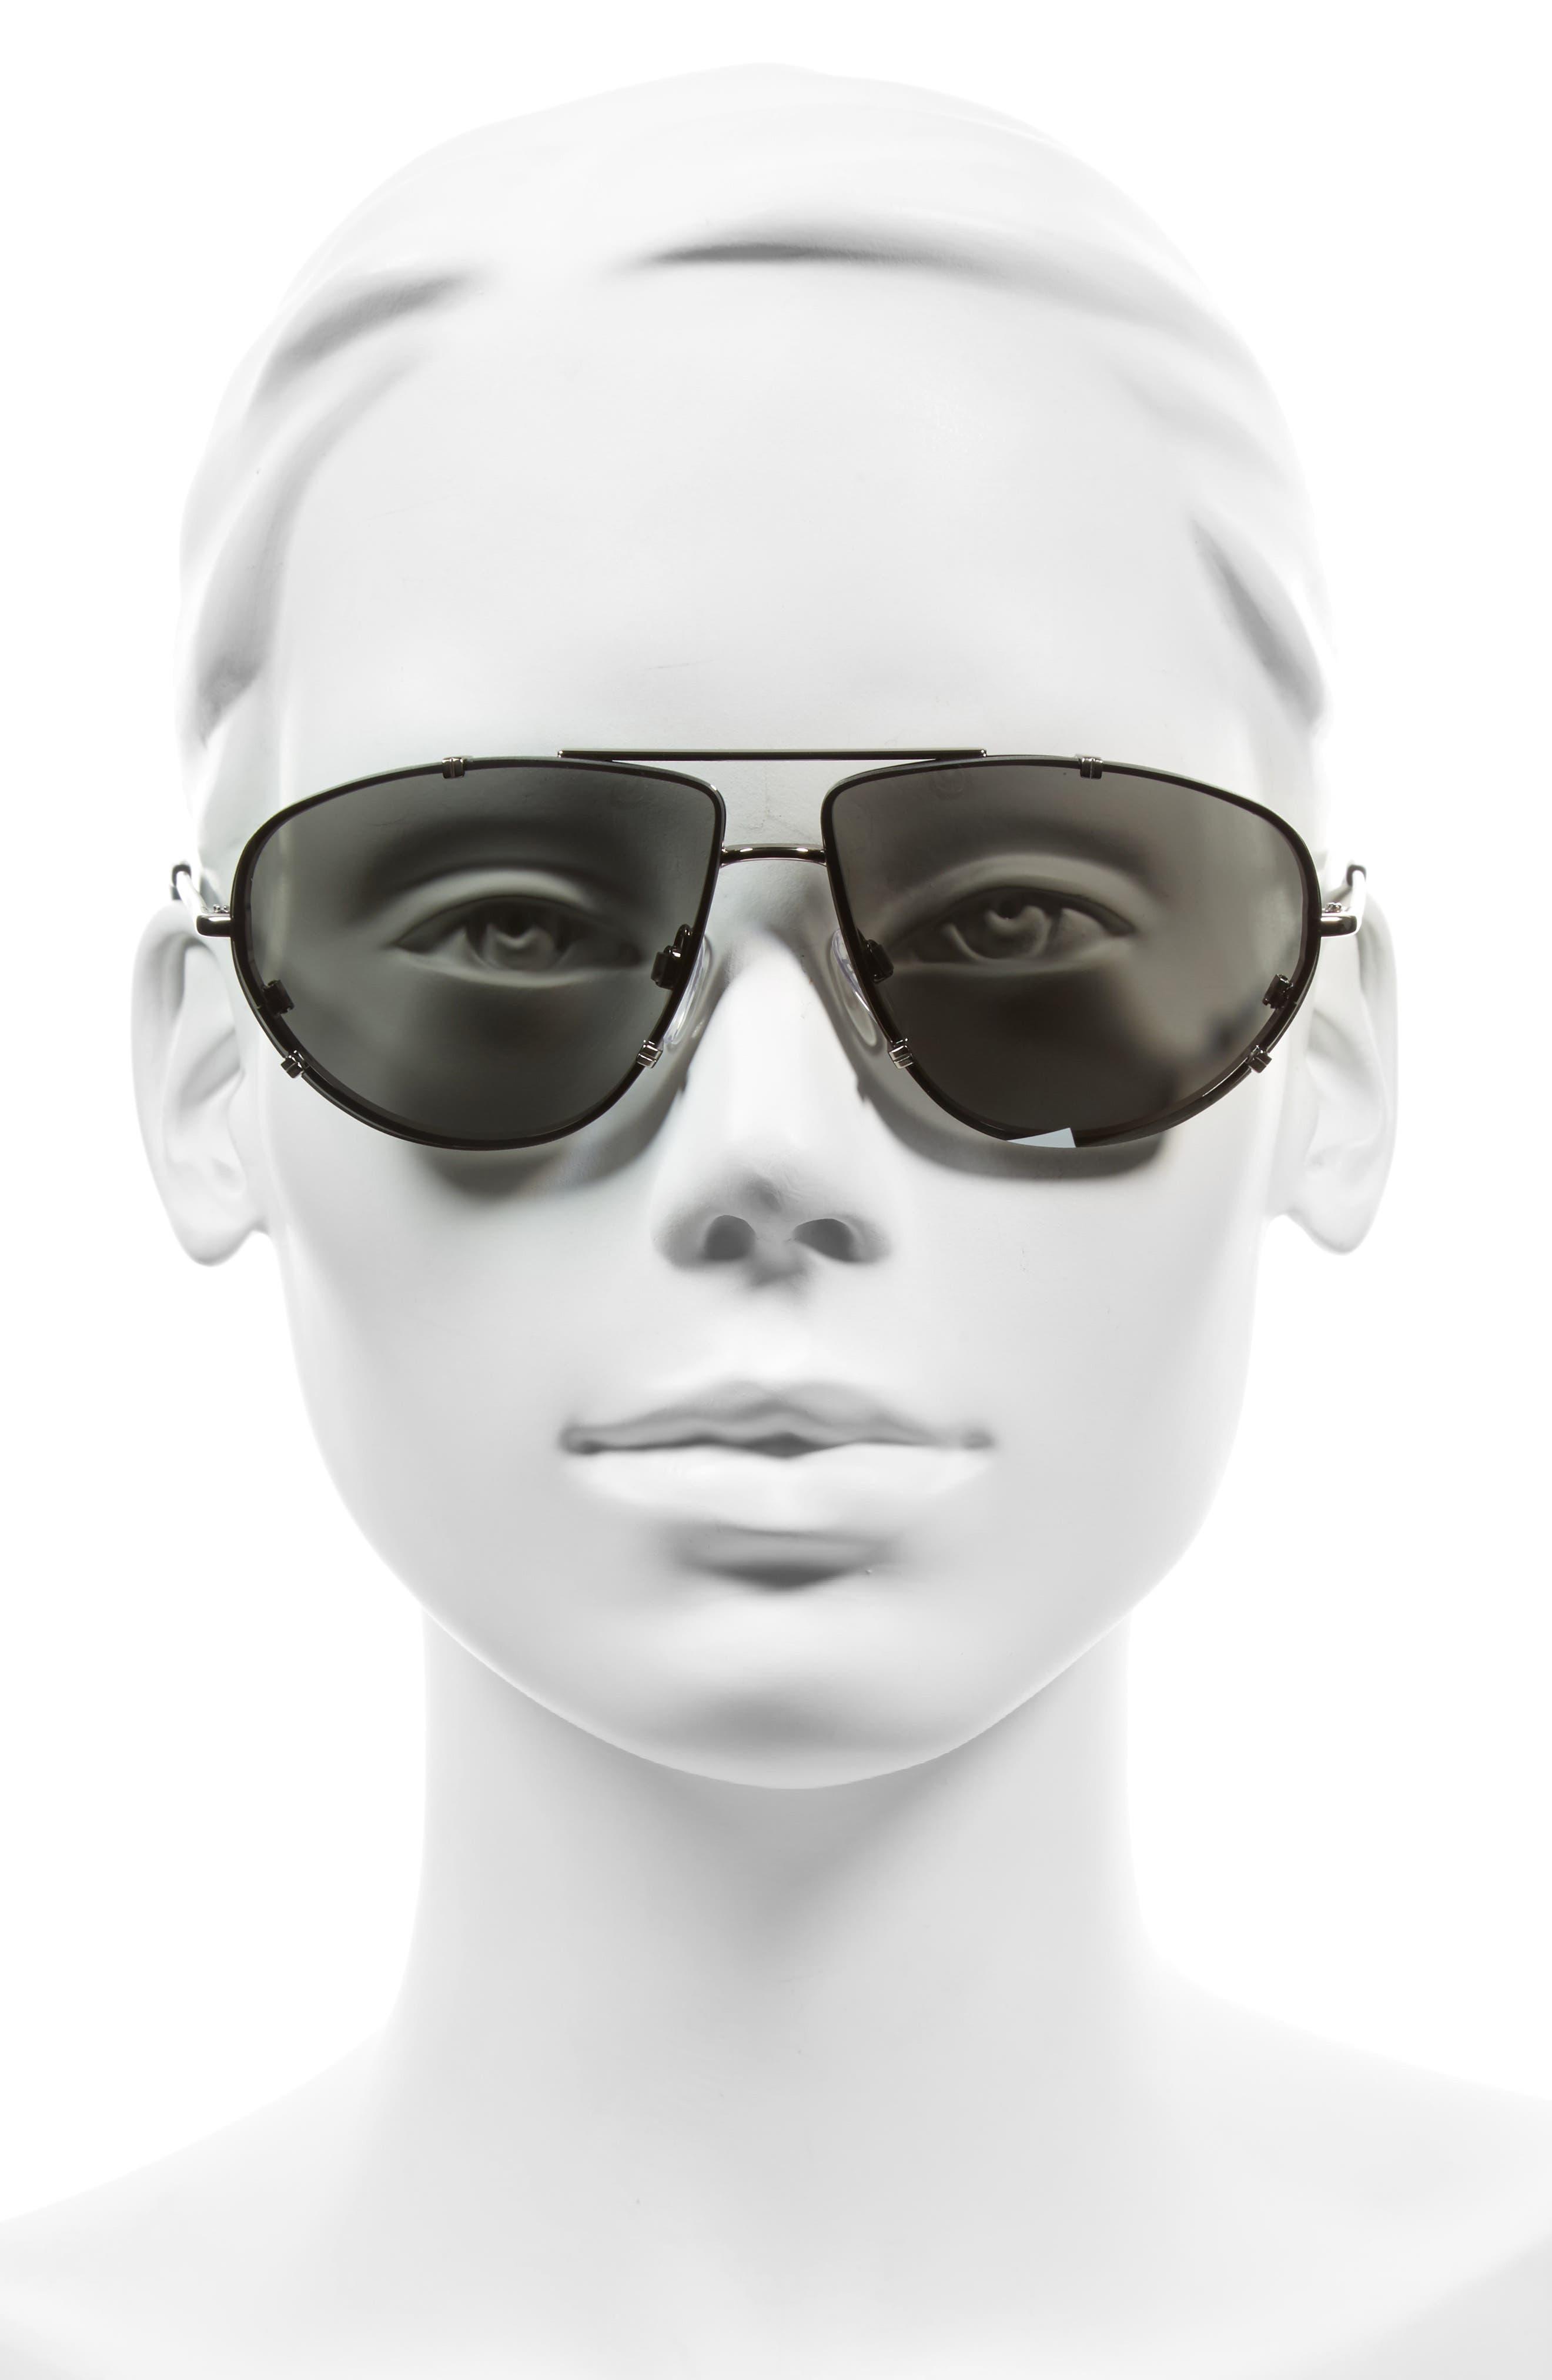 62mm Aviator Sunglasses,                             Alternate thumbnail 2, color,                             040